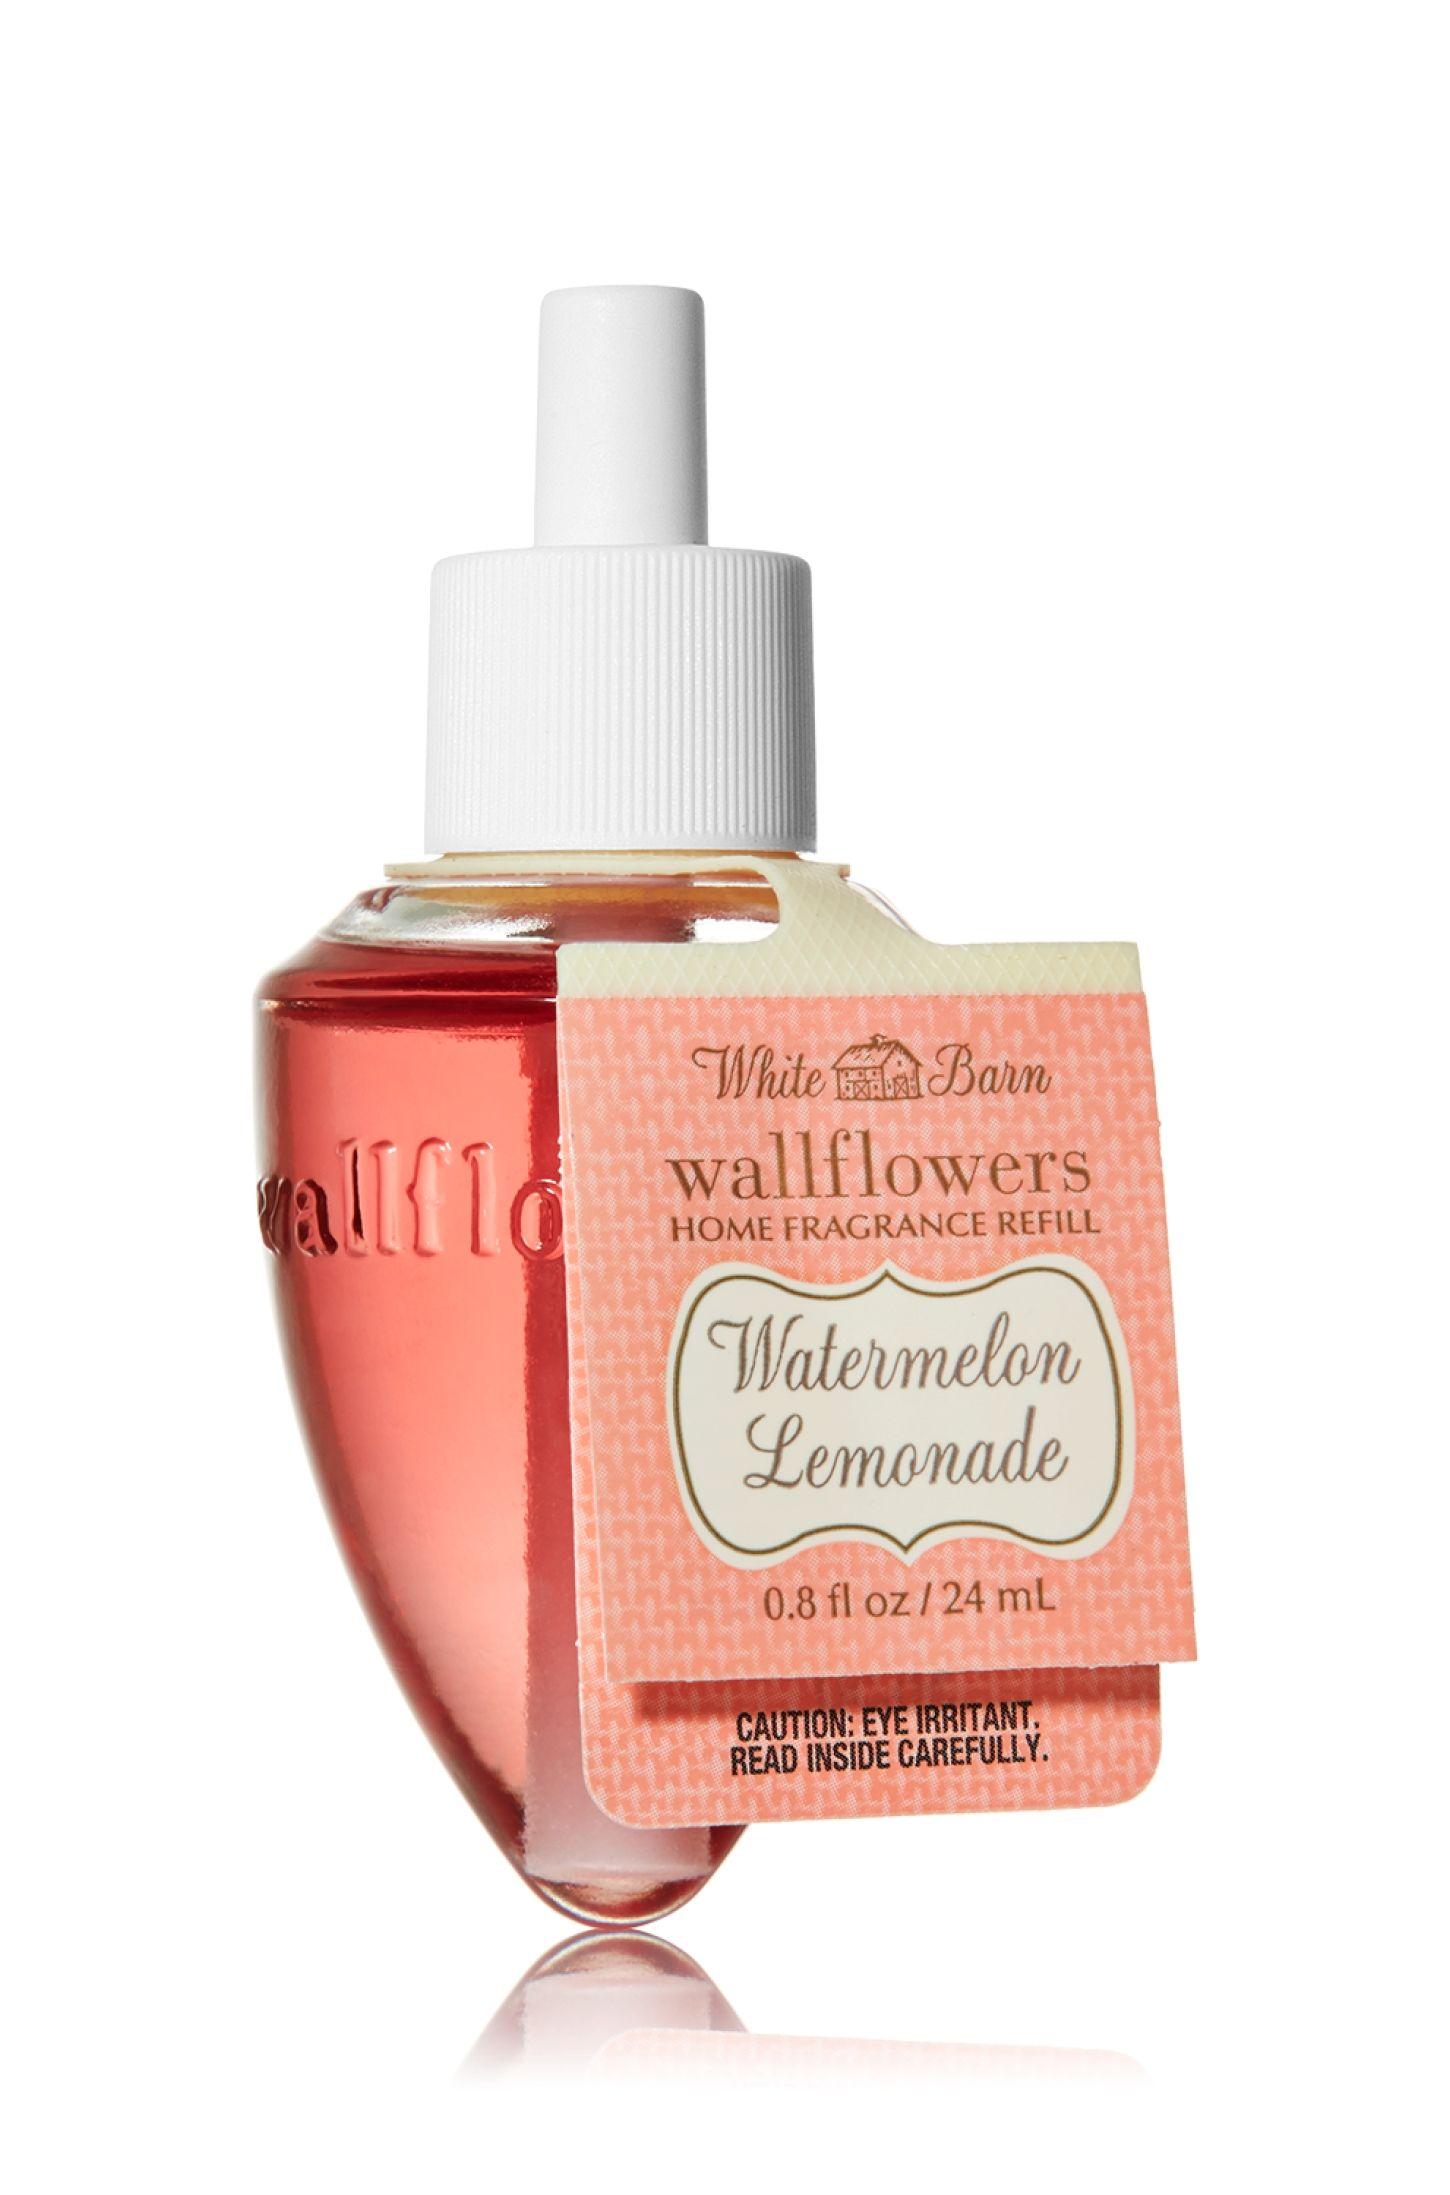 Watermelon Lemonade Wallflowers Fragrance Refill - Home Fragrance 1037181 - Bath & Body Works